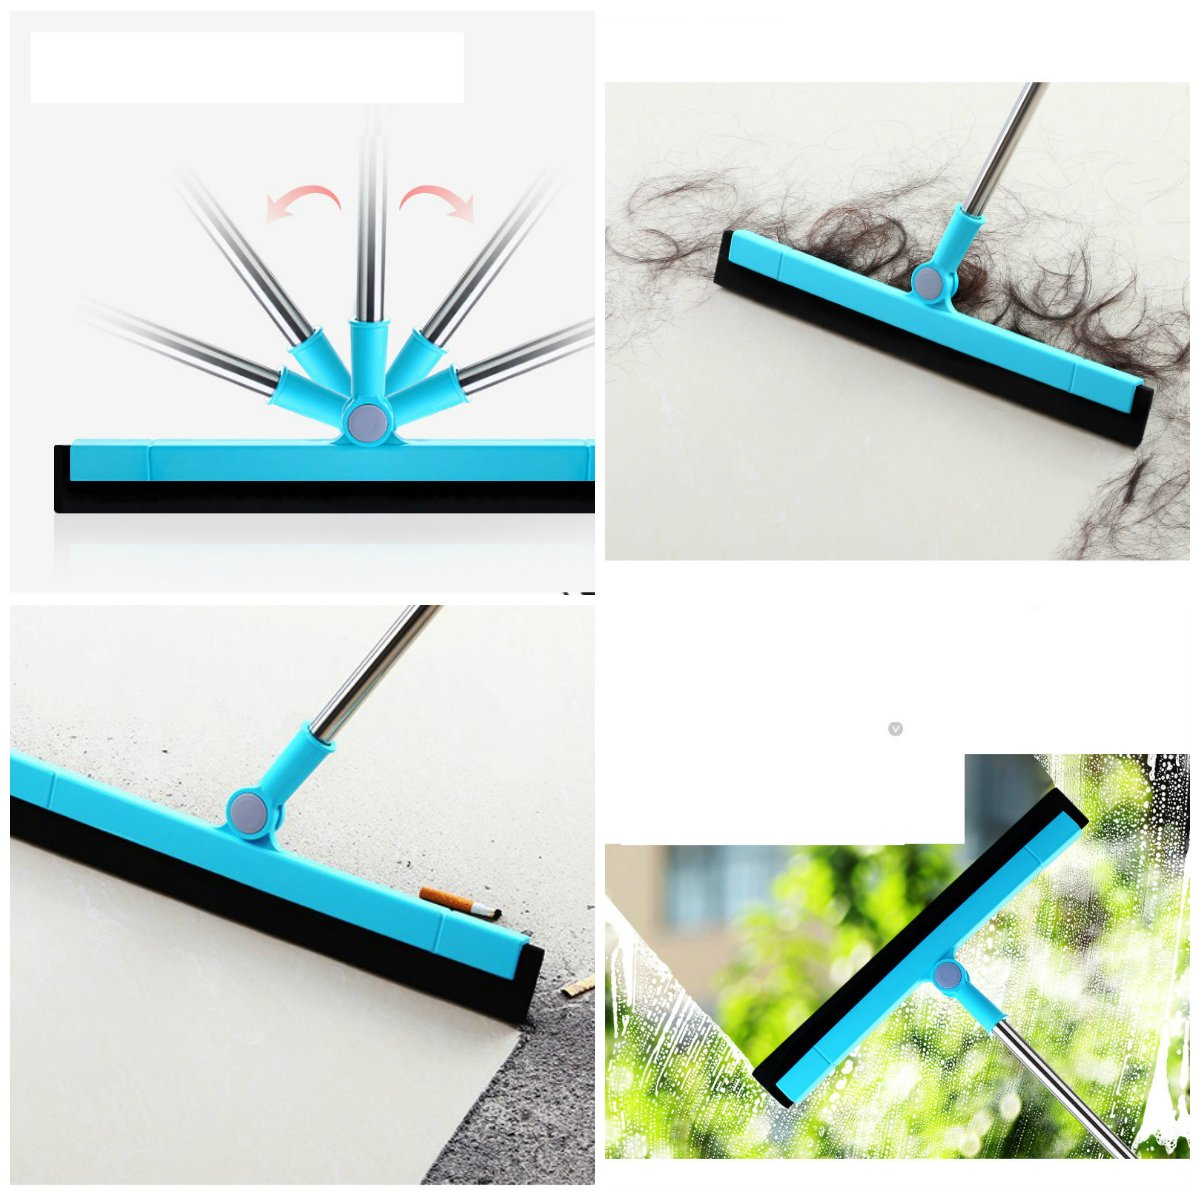 Floor Squeegee Wiper Window Squeegee Cleaner Blade Water Wiper Glass Sweep Brush for Bathroom Wet Room Floor Pet Hair Window Cleaning by Ying (Image #2)